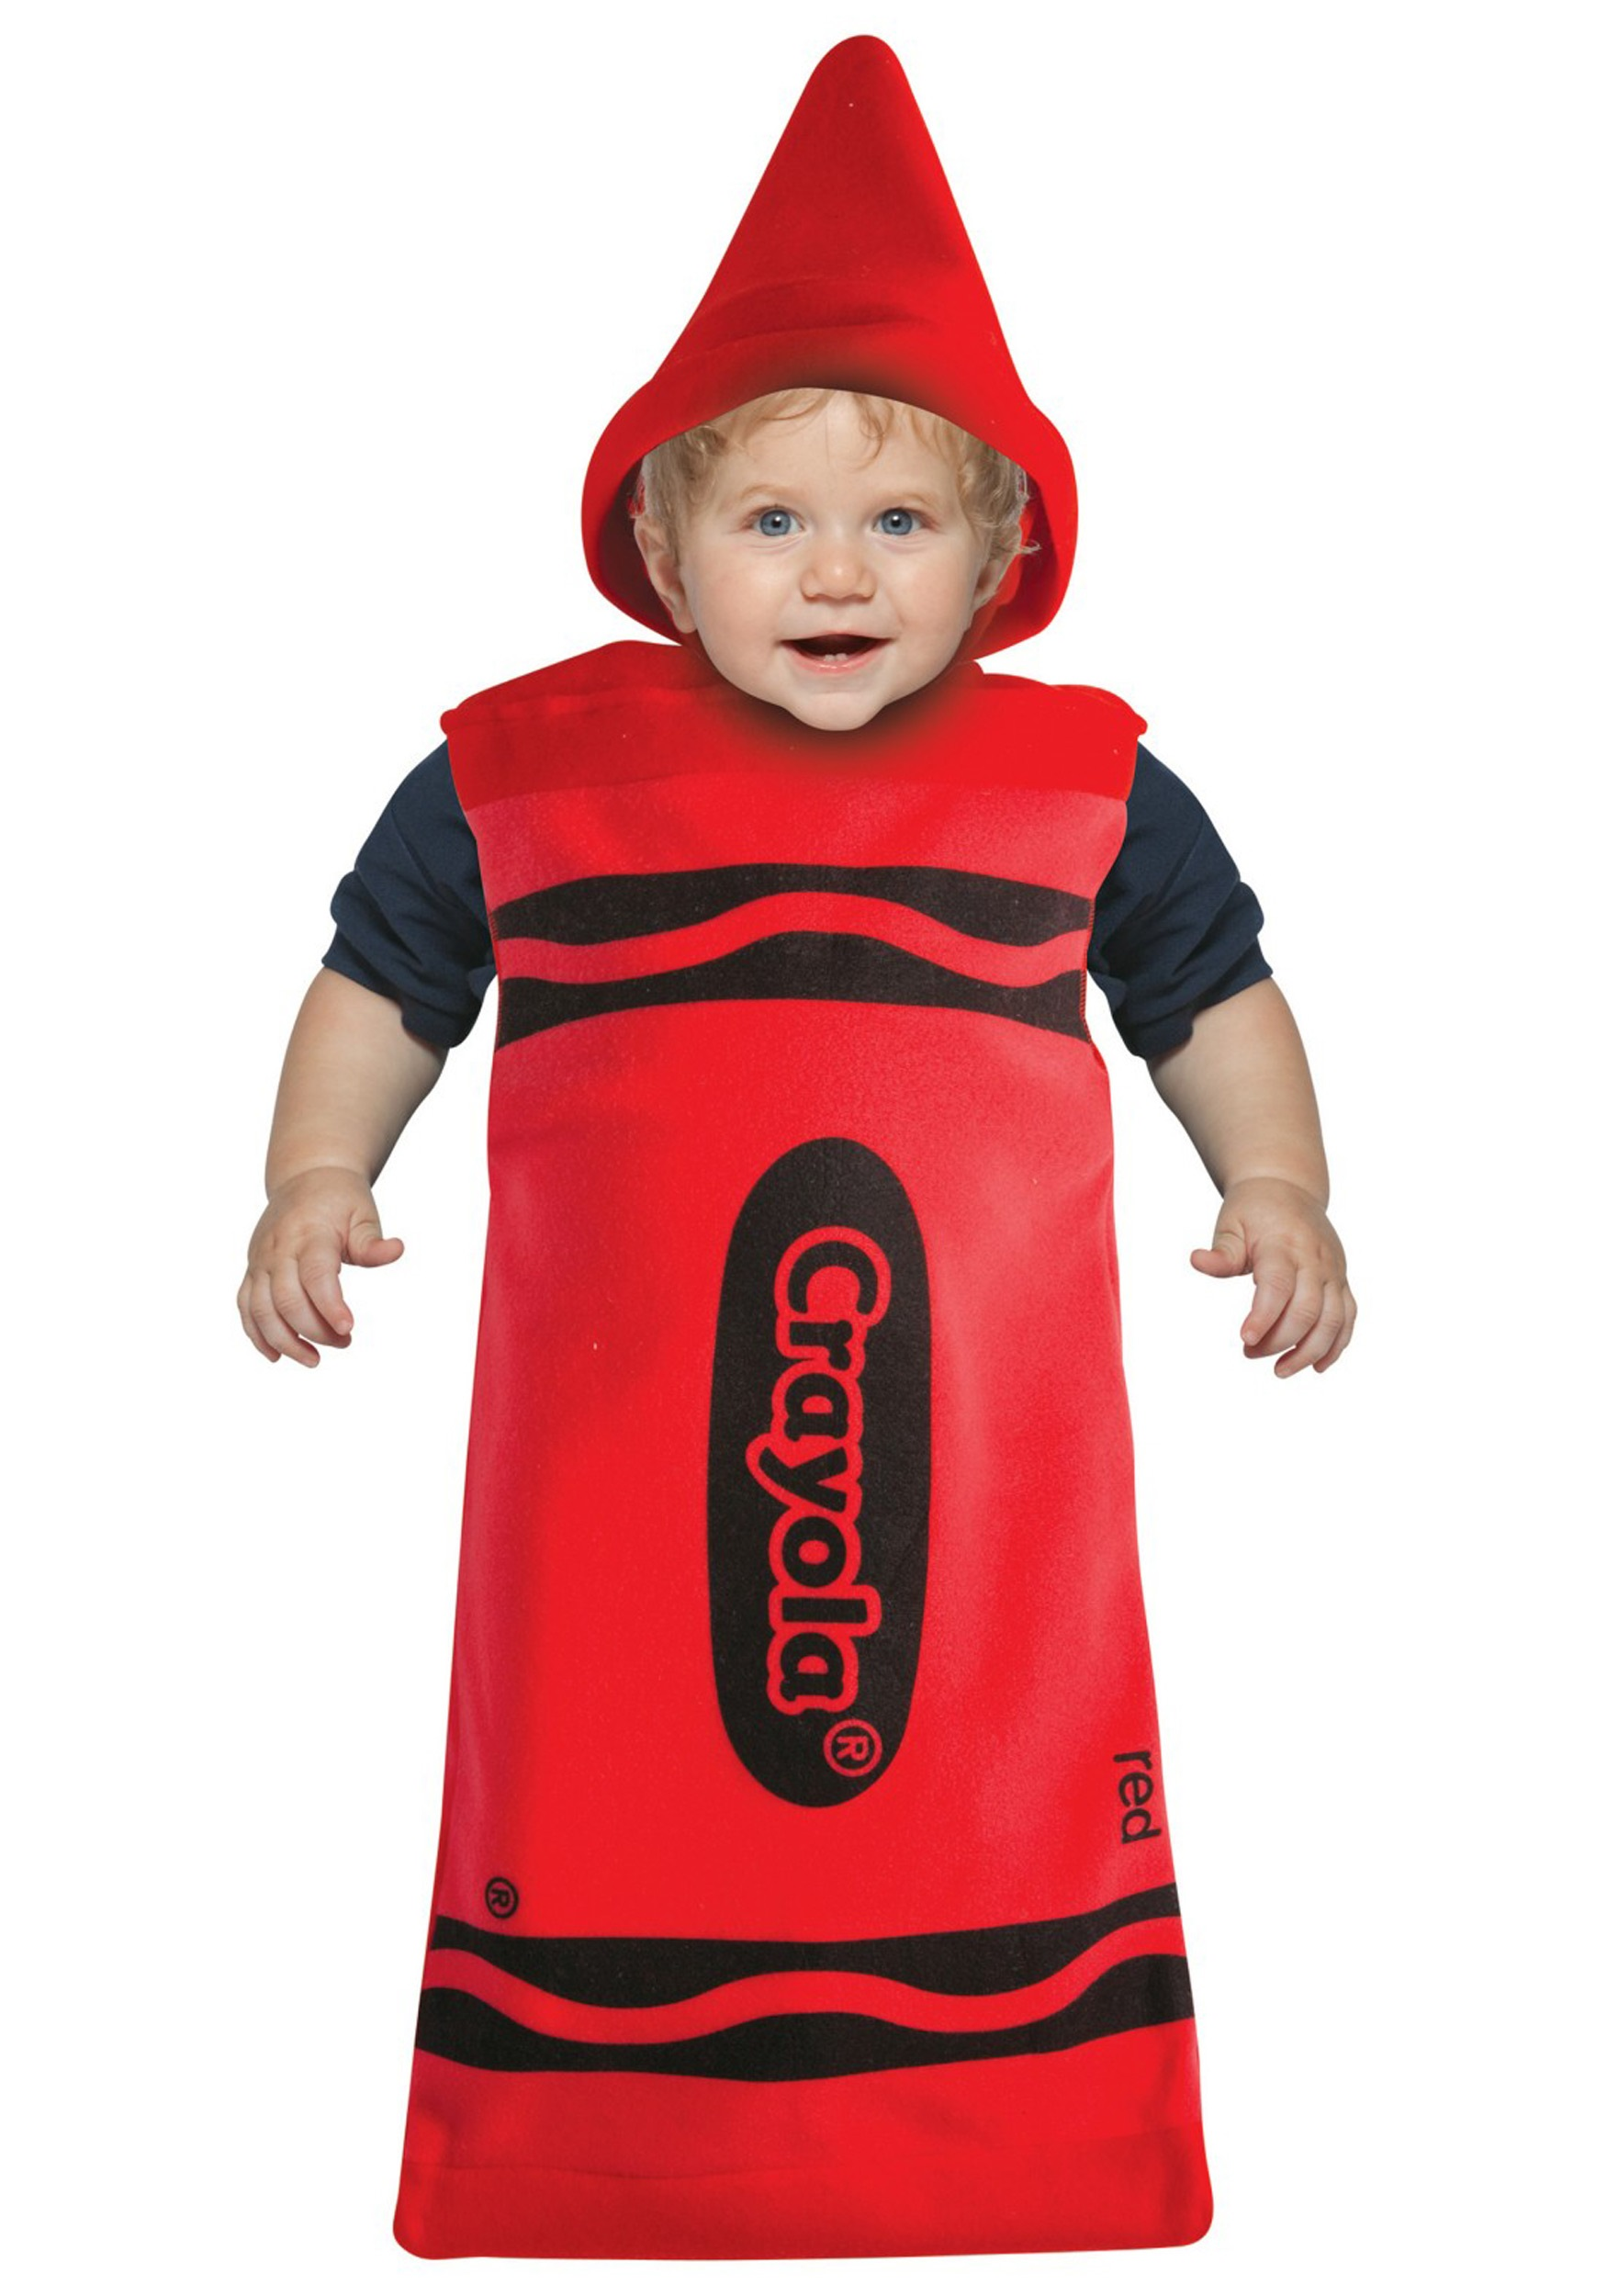 Crayon Costumes Costumes Fc  sc 1 st  Meningrey & Crayon Costume Kids - Meningrey